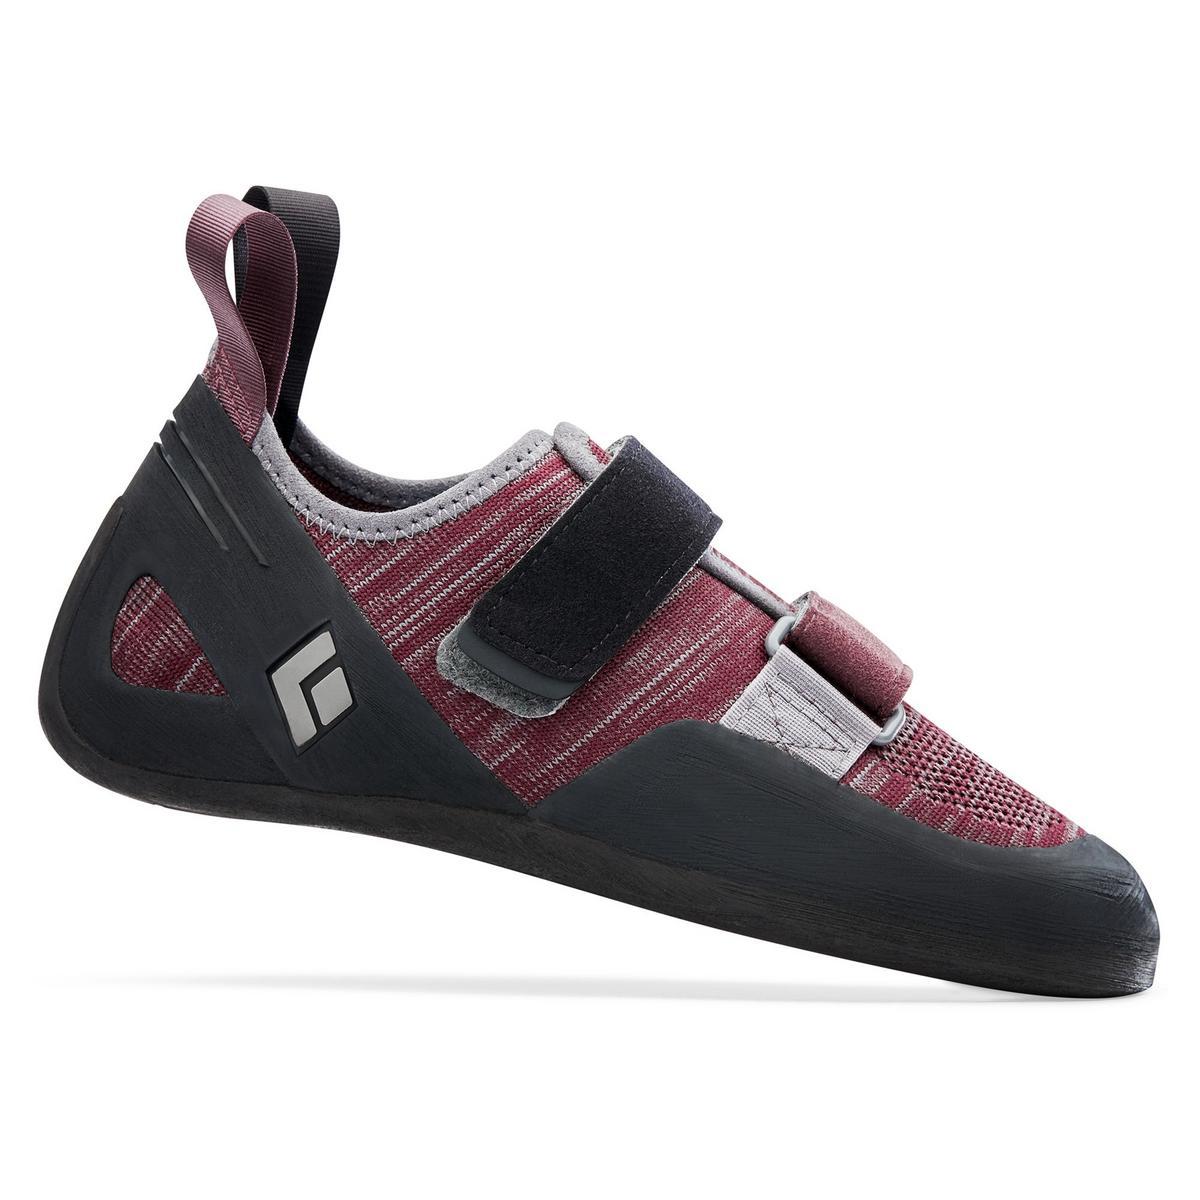 Black Diamond Equipment Black Diamond Rock Shoes Women's Momentum Merlot